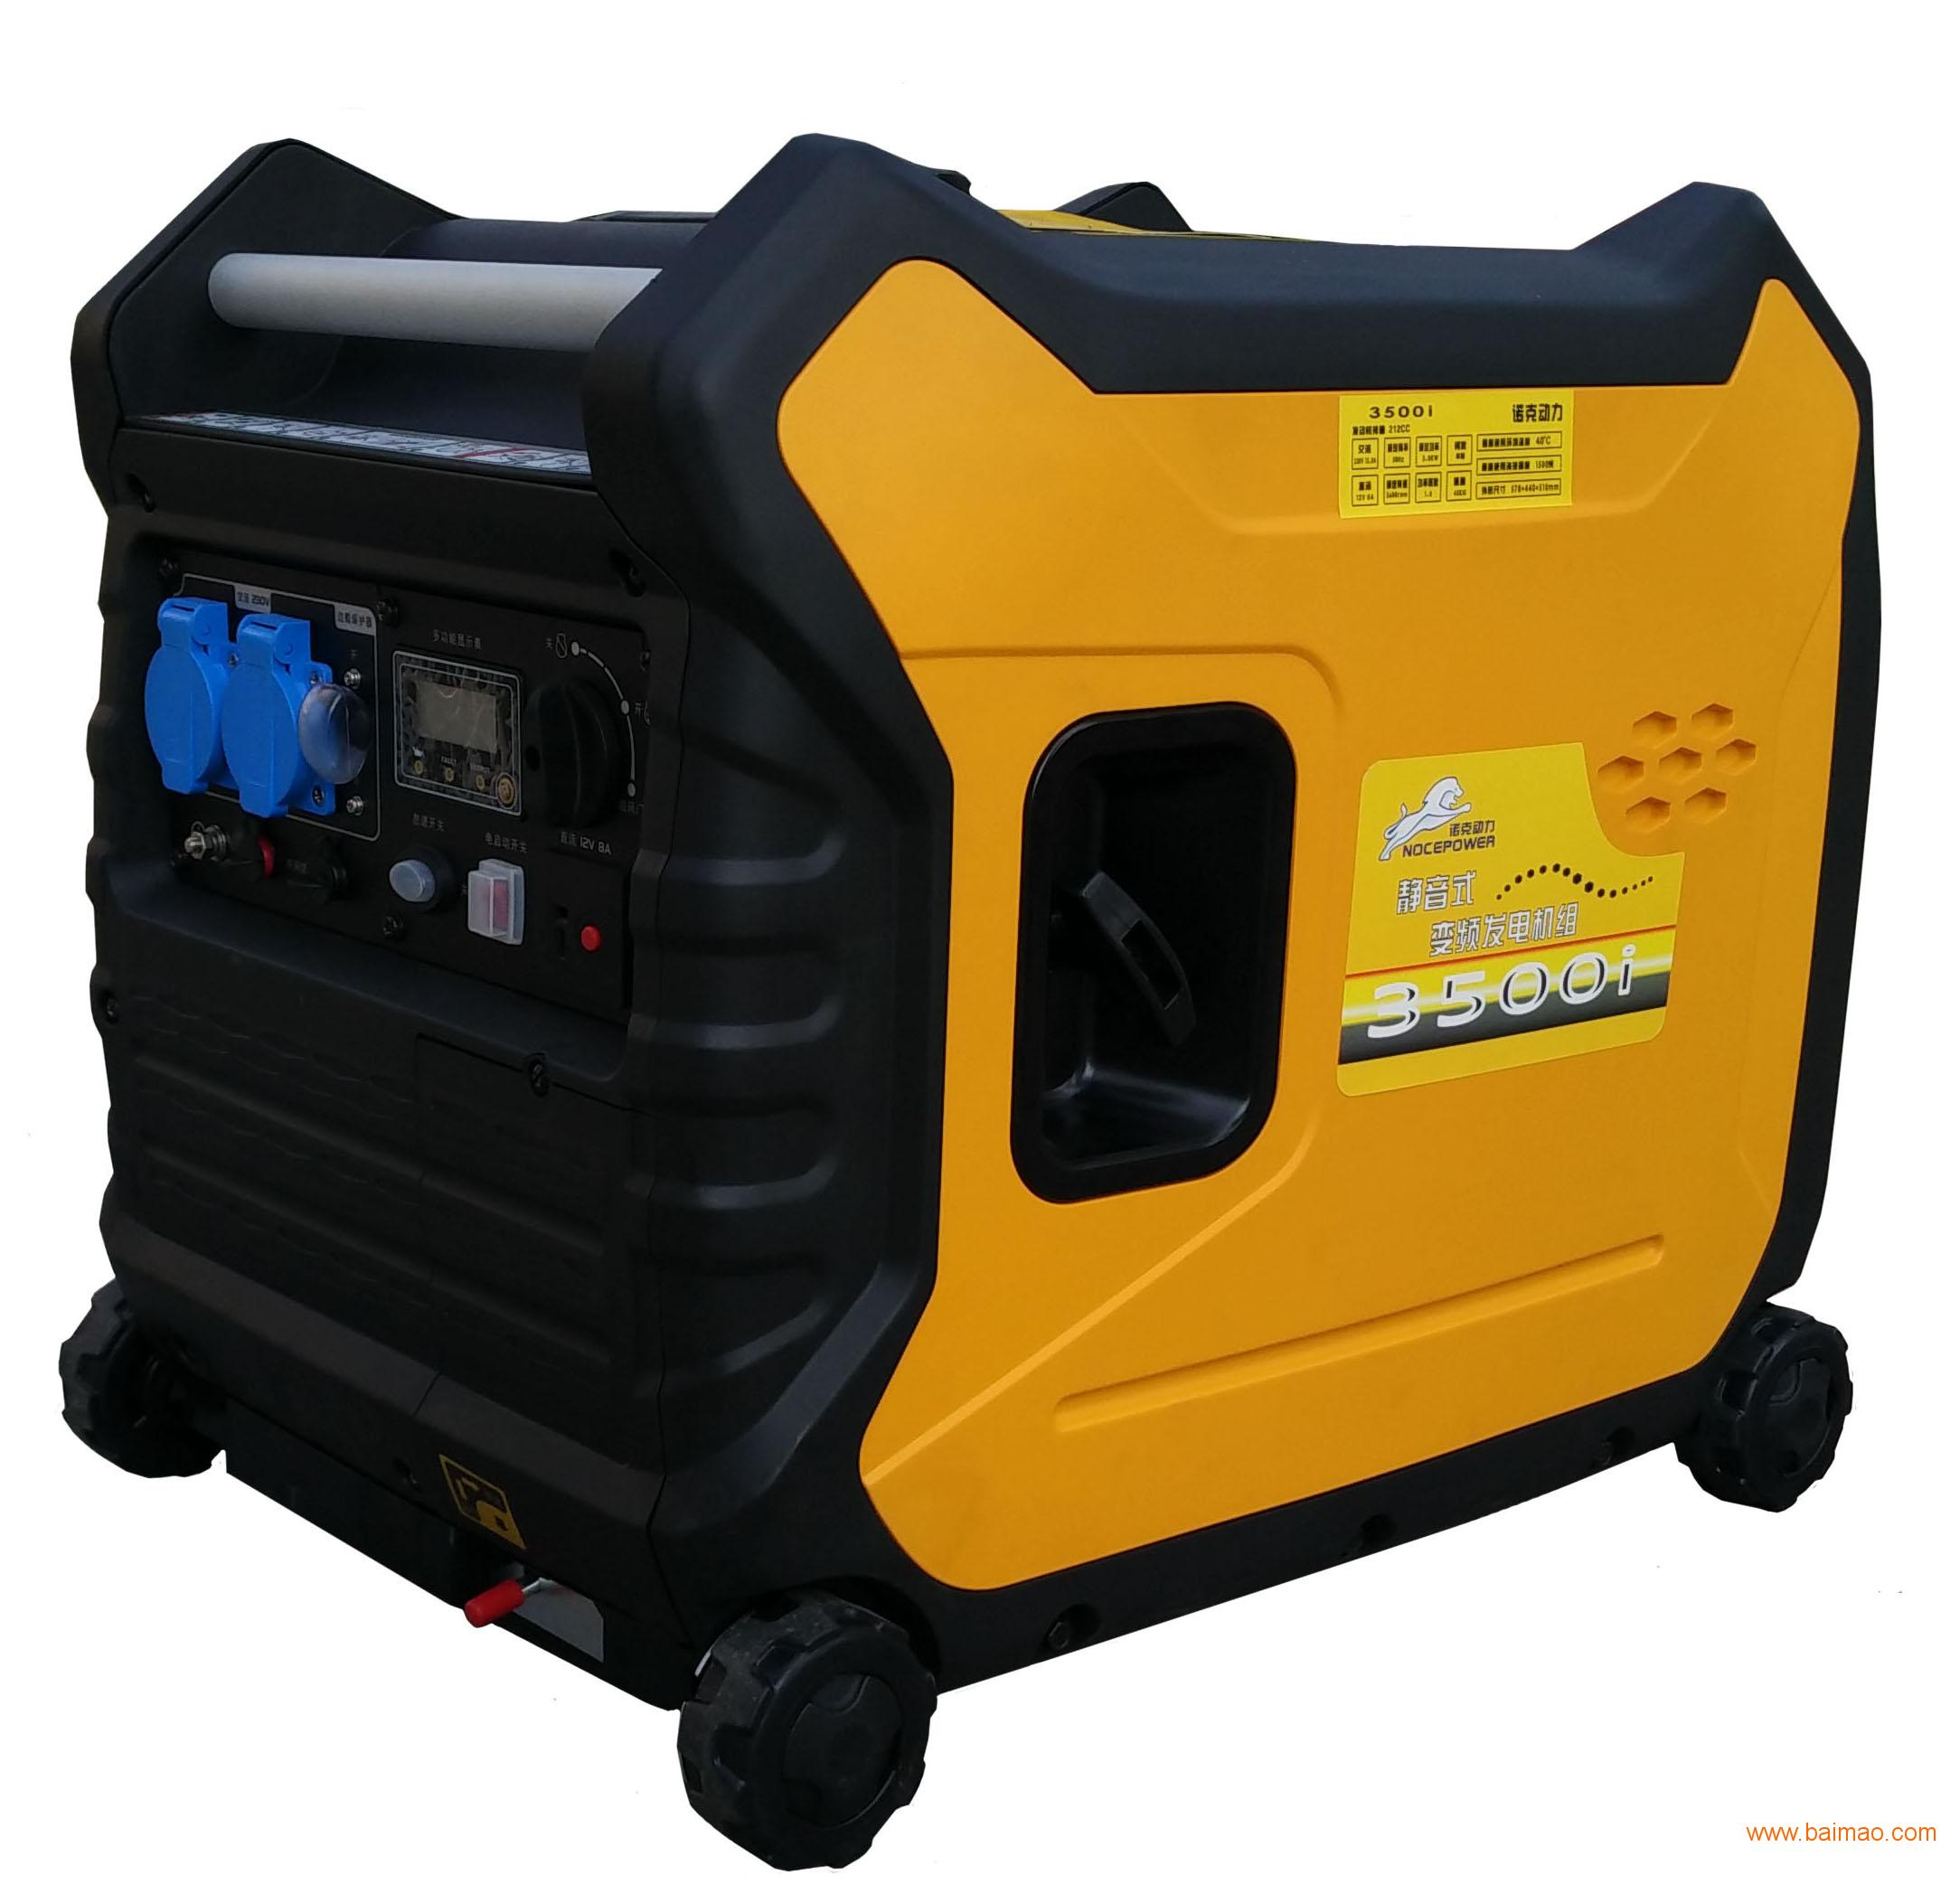 �9�nK��K�>���i��K���_诺克便携式3kw静音汽油发电机nk-3500i